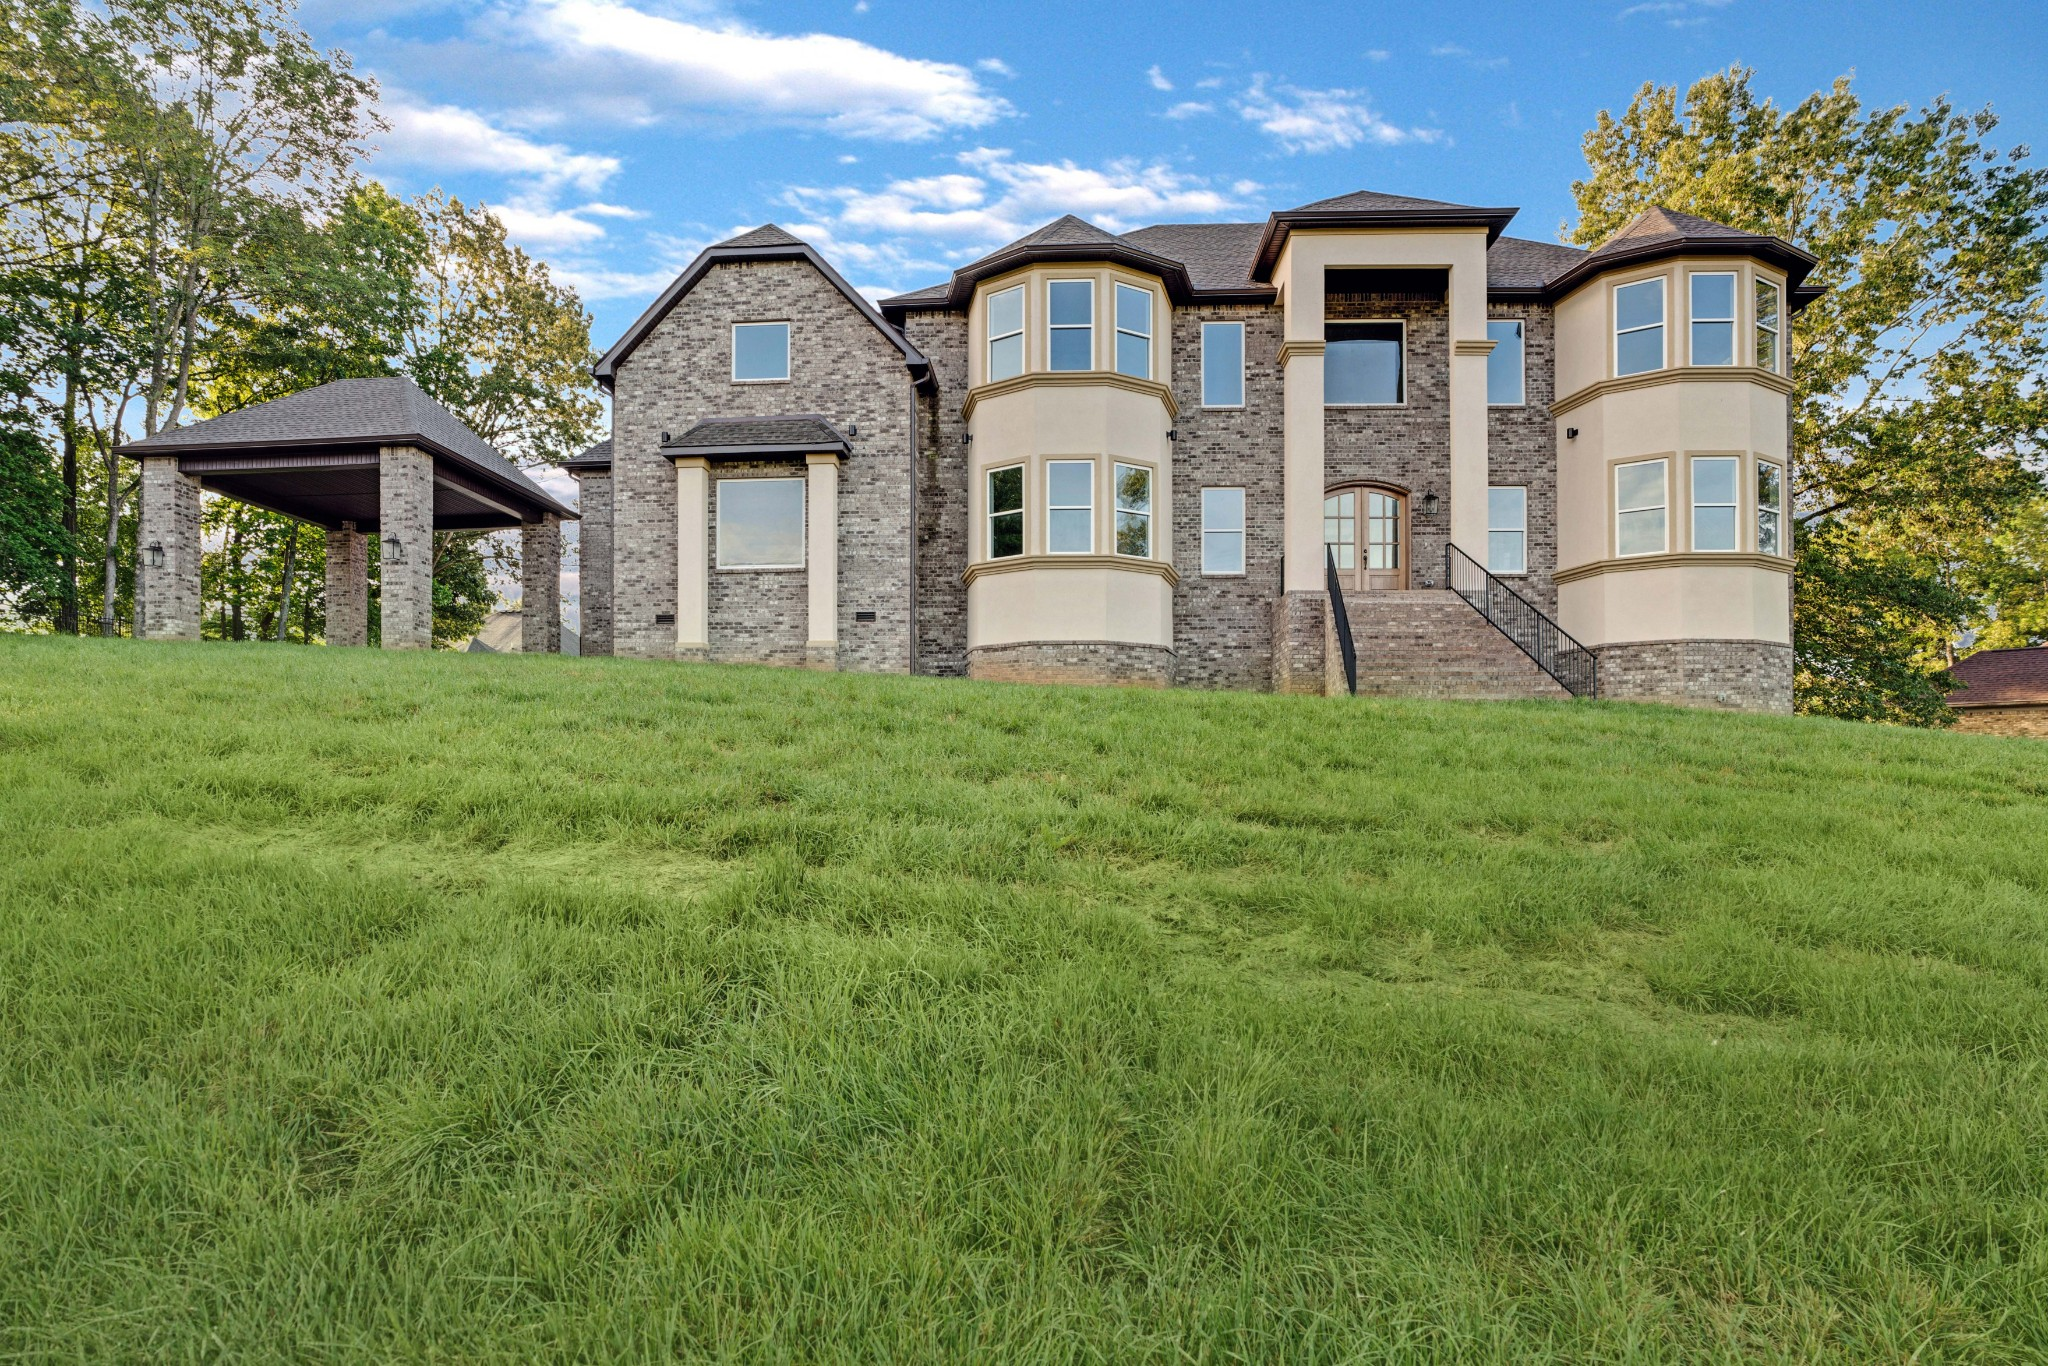 2075 Mossy Oak Cir, Clarksville, TN 37040 - Clarksville, TN real estate listing